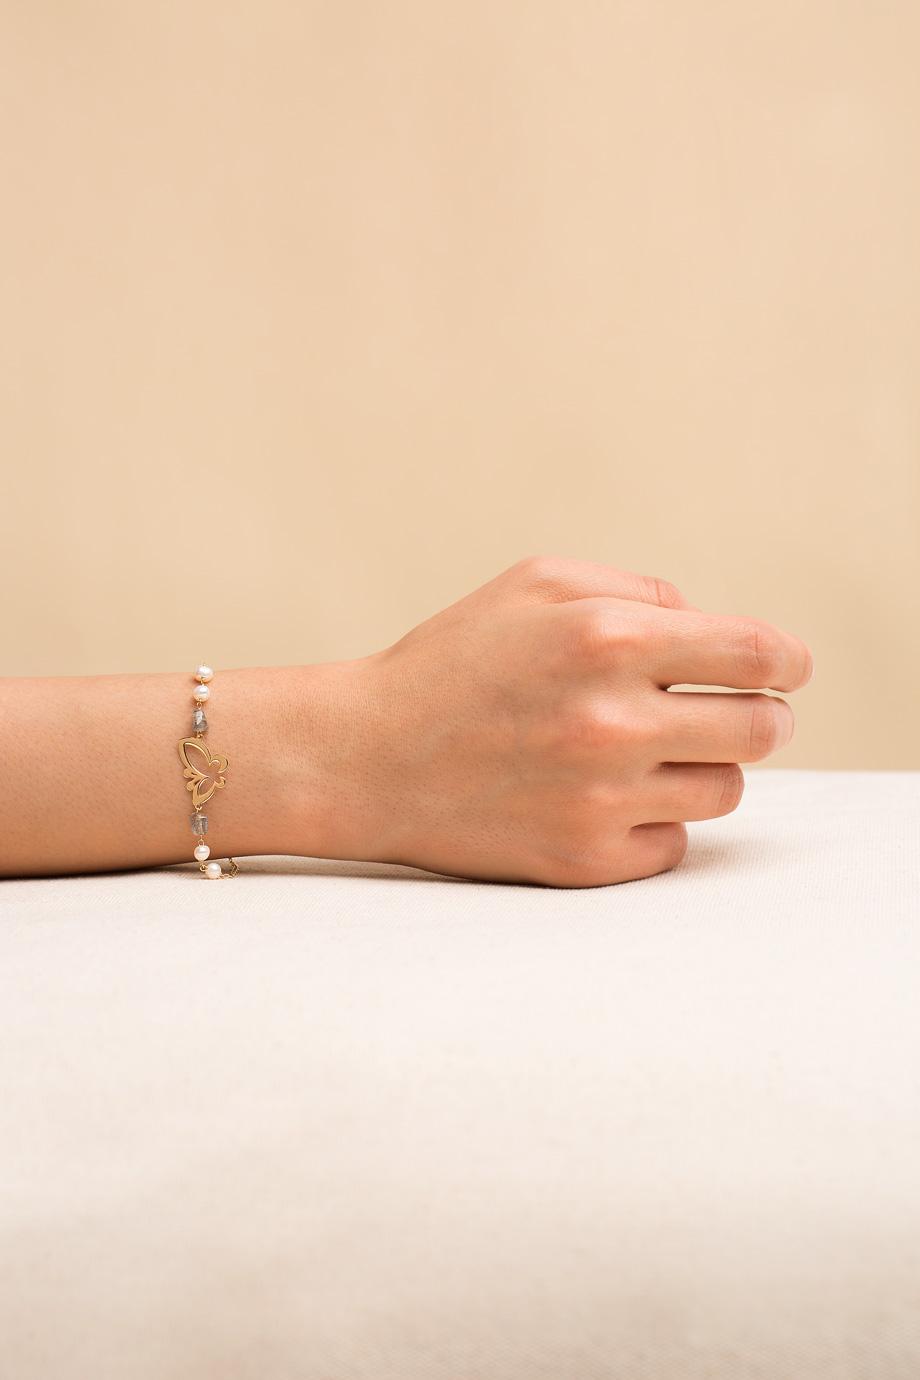 دستبند طلا پروانه